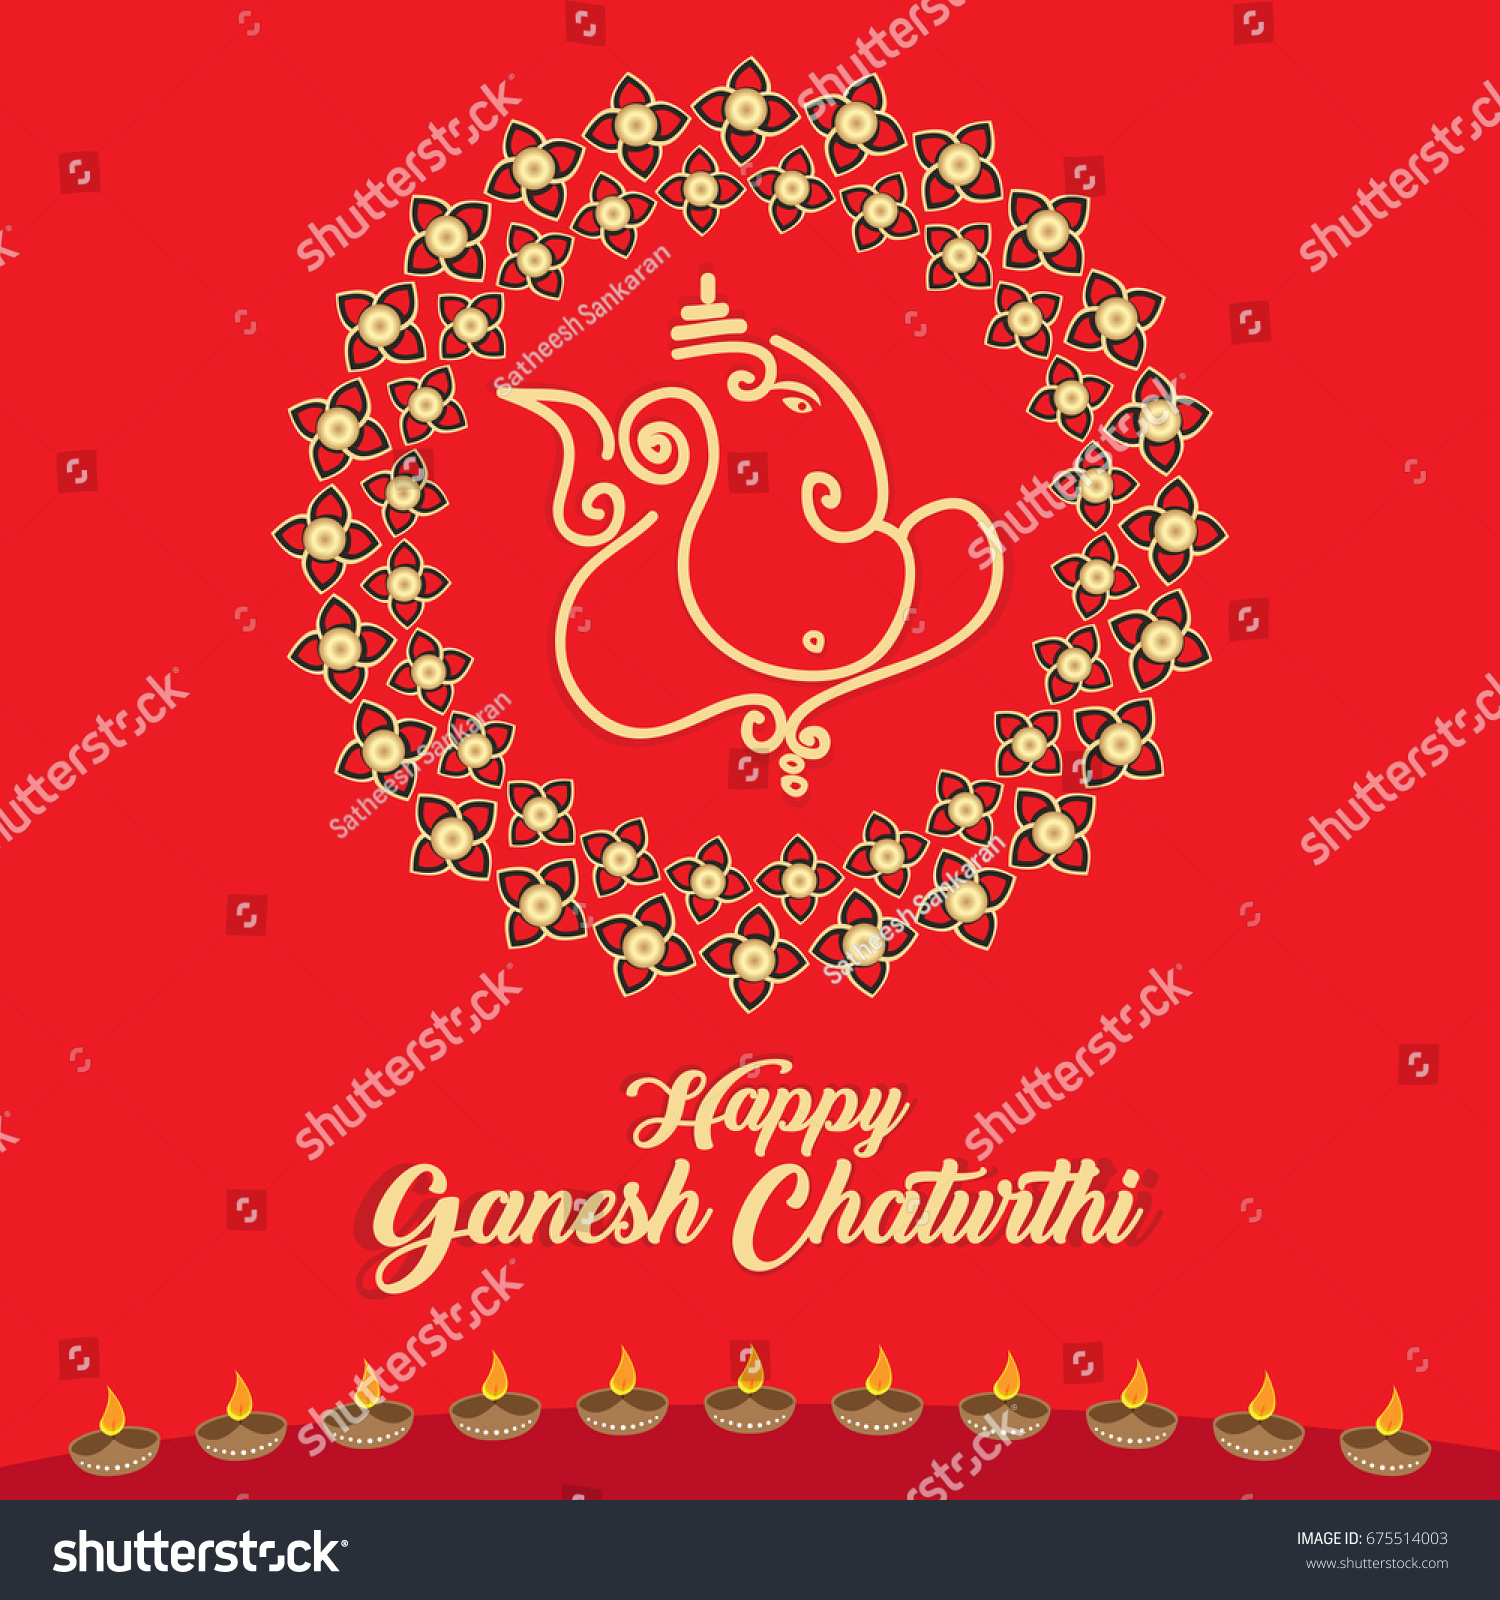 Happy Ganesh Chaturthi Greeting Card Vector Stock Vector 675514003